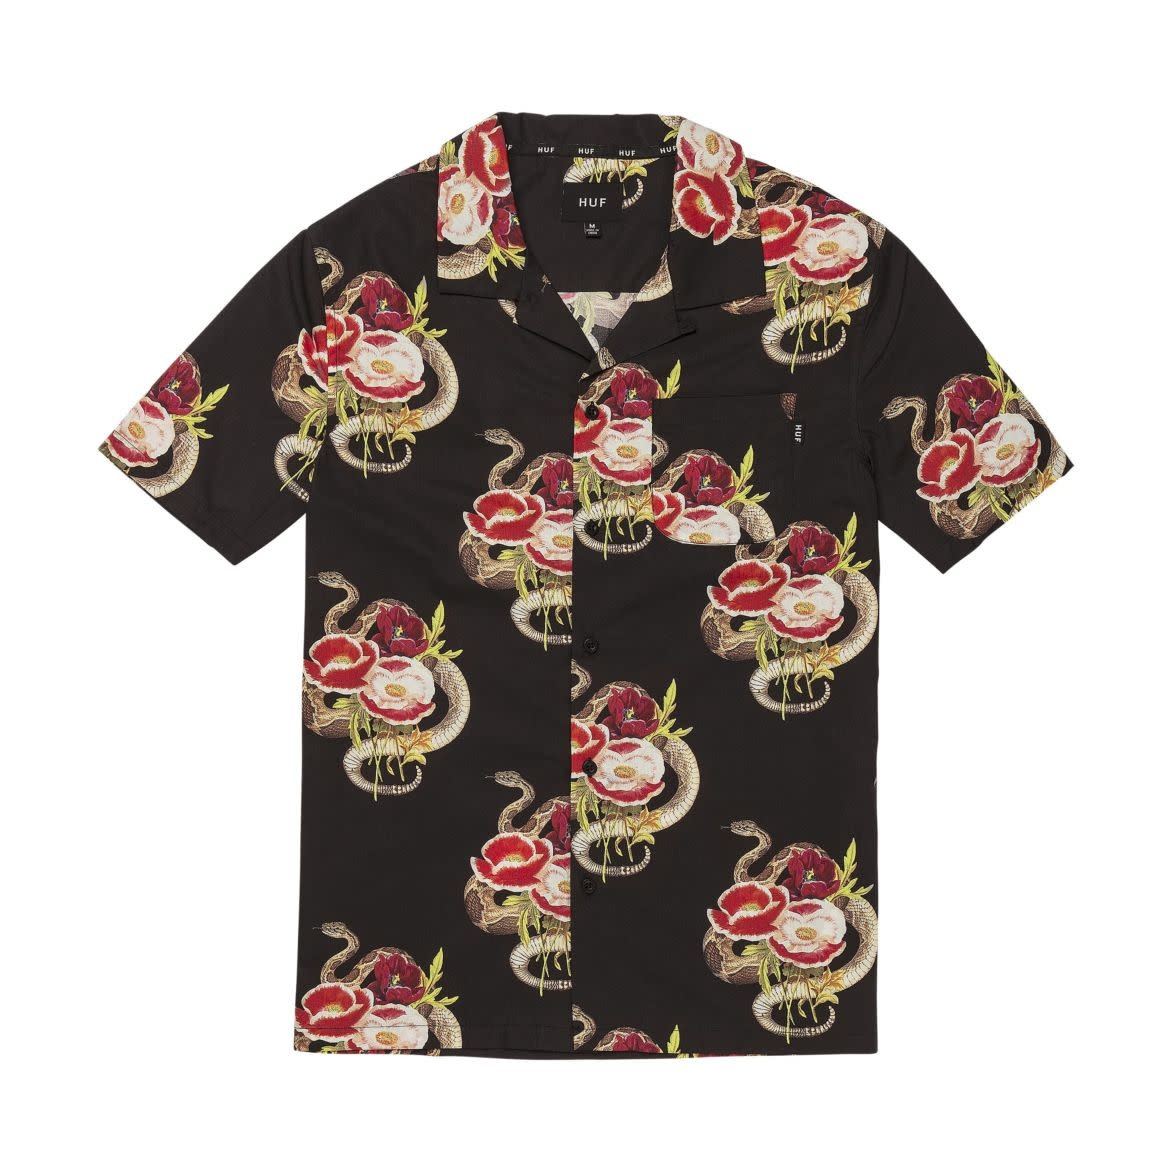 HUF Camden Woven Shirt Black